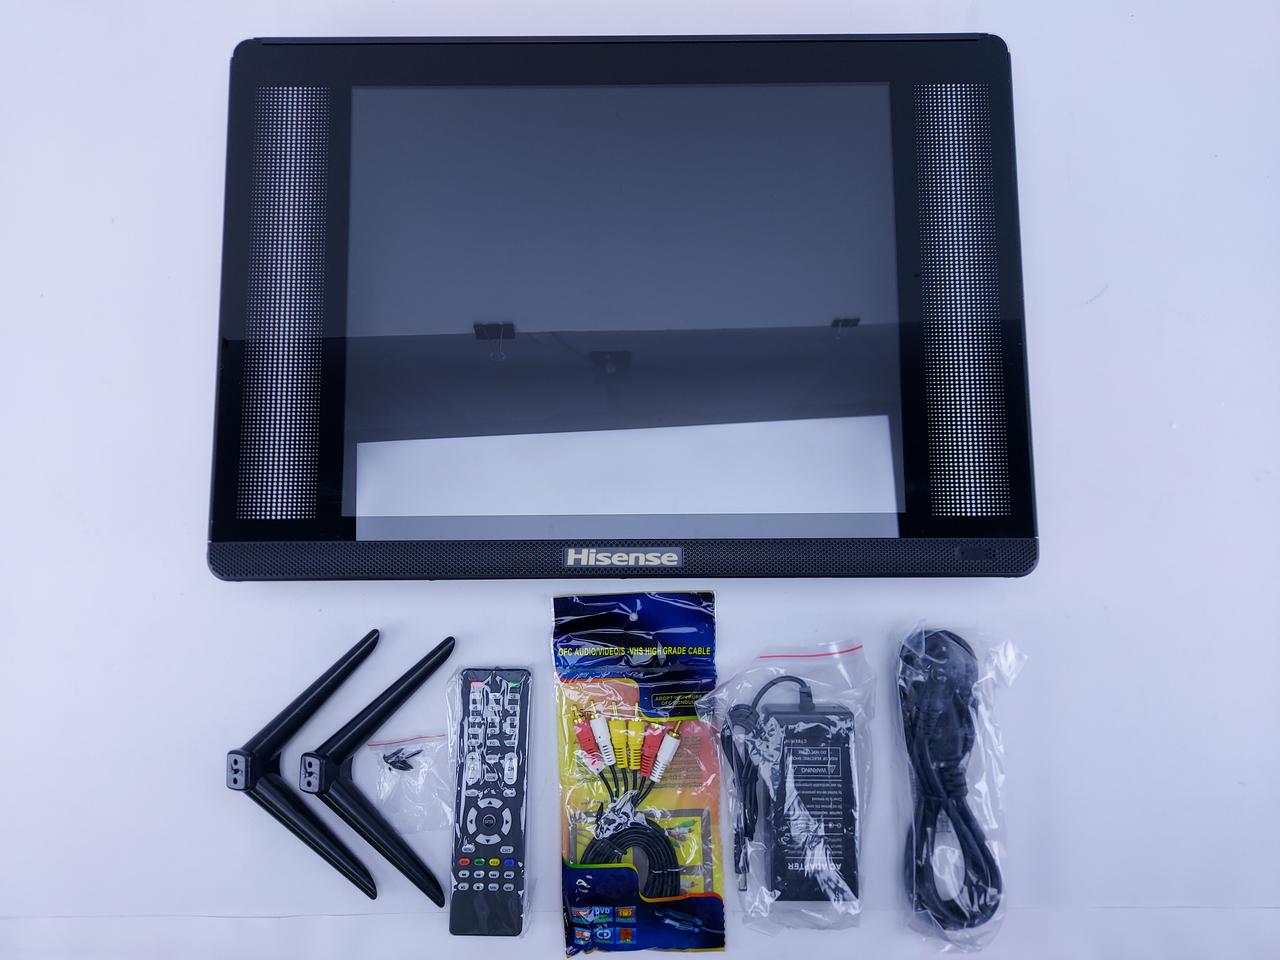 "Телевизор Hisense 19"" HD-Ready/DVB-T2/USB (1366x768)"